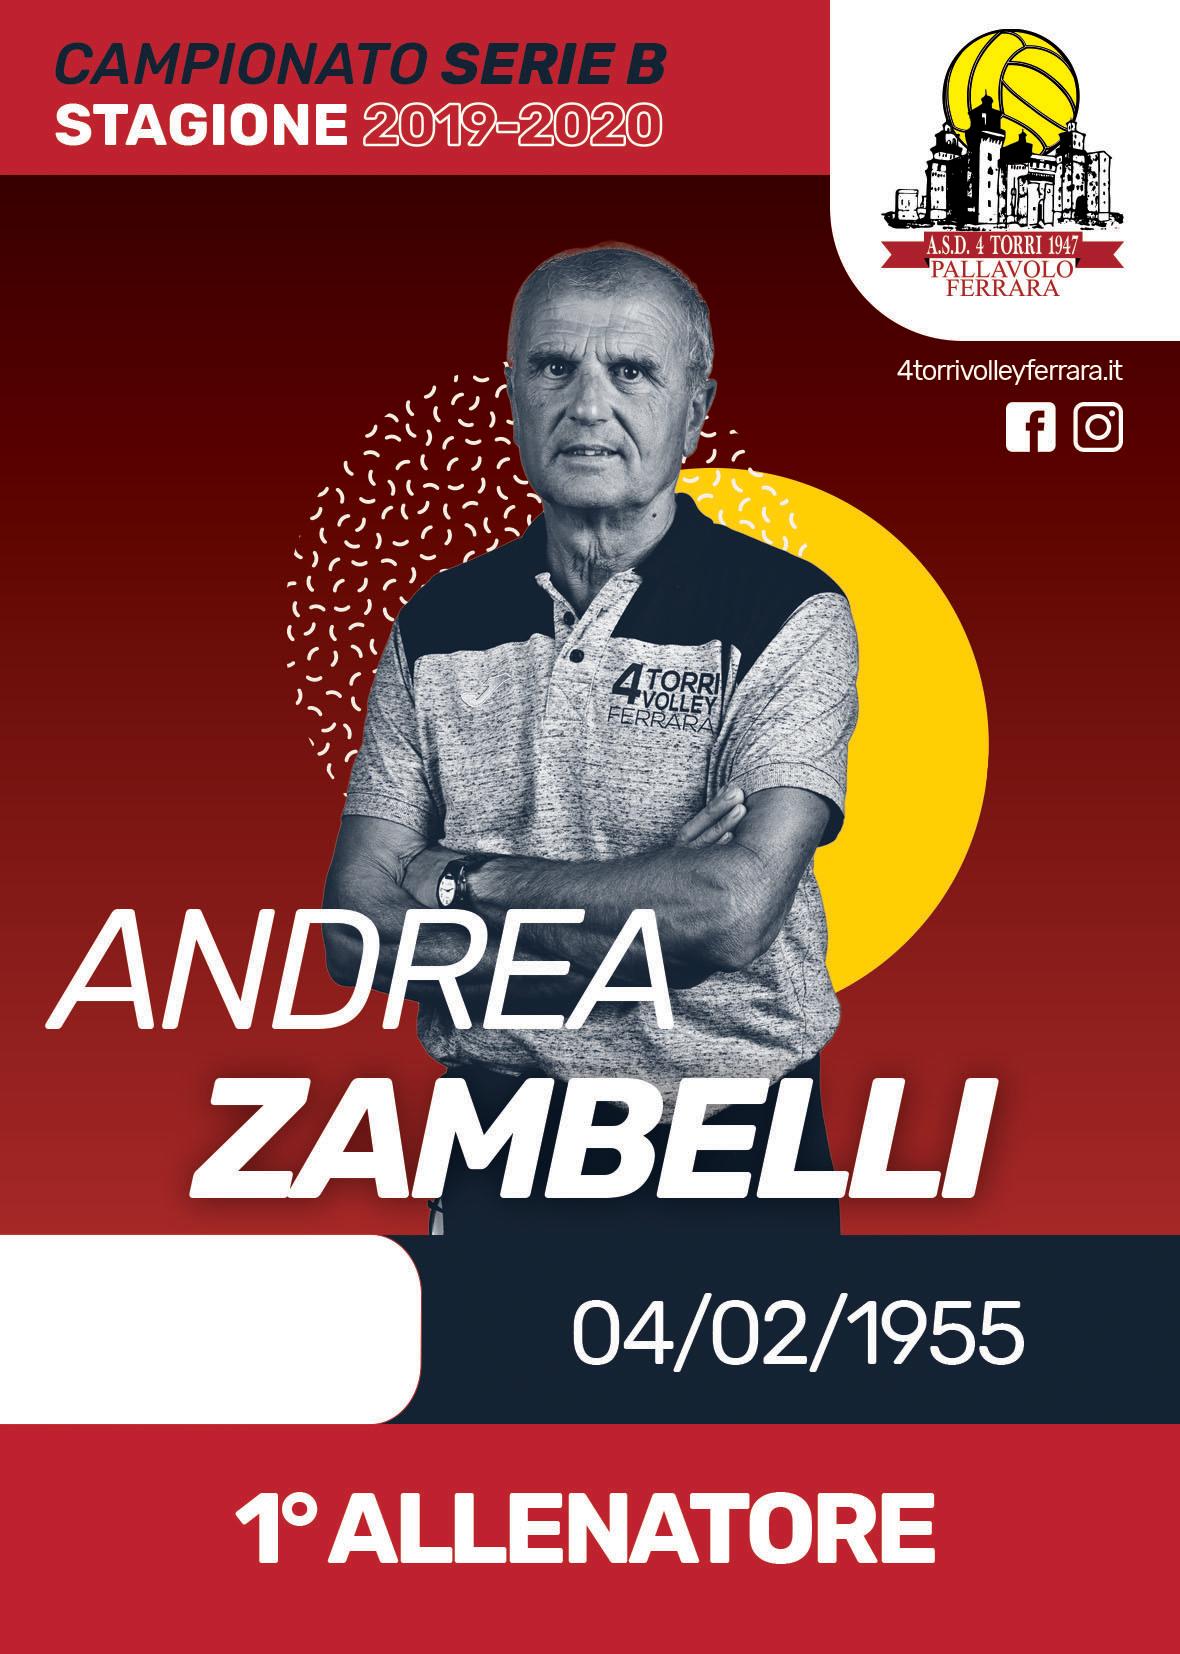 andrea-zambelli - A.s.d. 4 Torri 1947 Pallavolo Ferrara